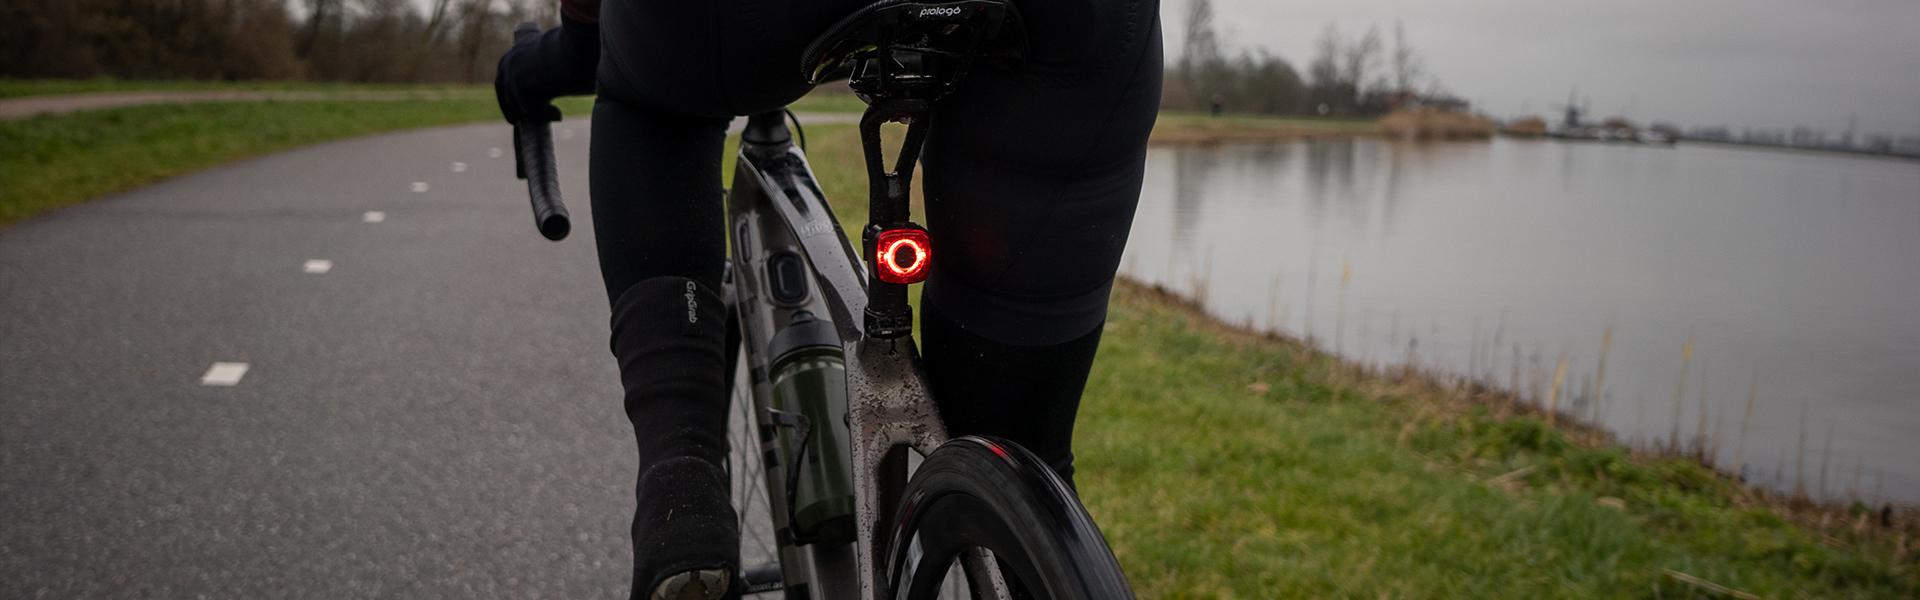 Sate-lite 30 LUX USB rechargeable bike light StVZO eletric bike front light CREE  LED waterproof